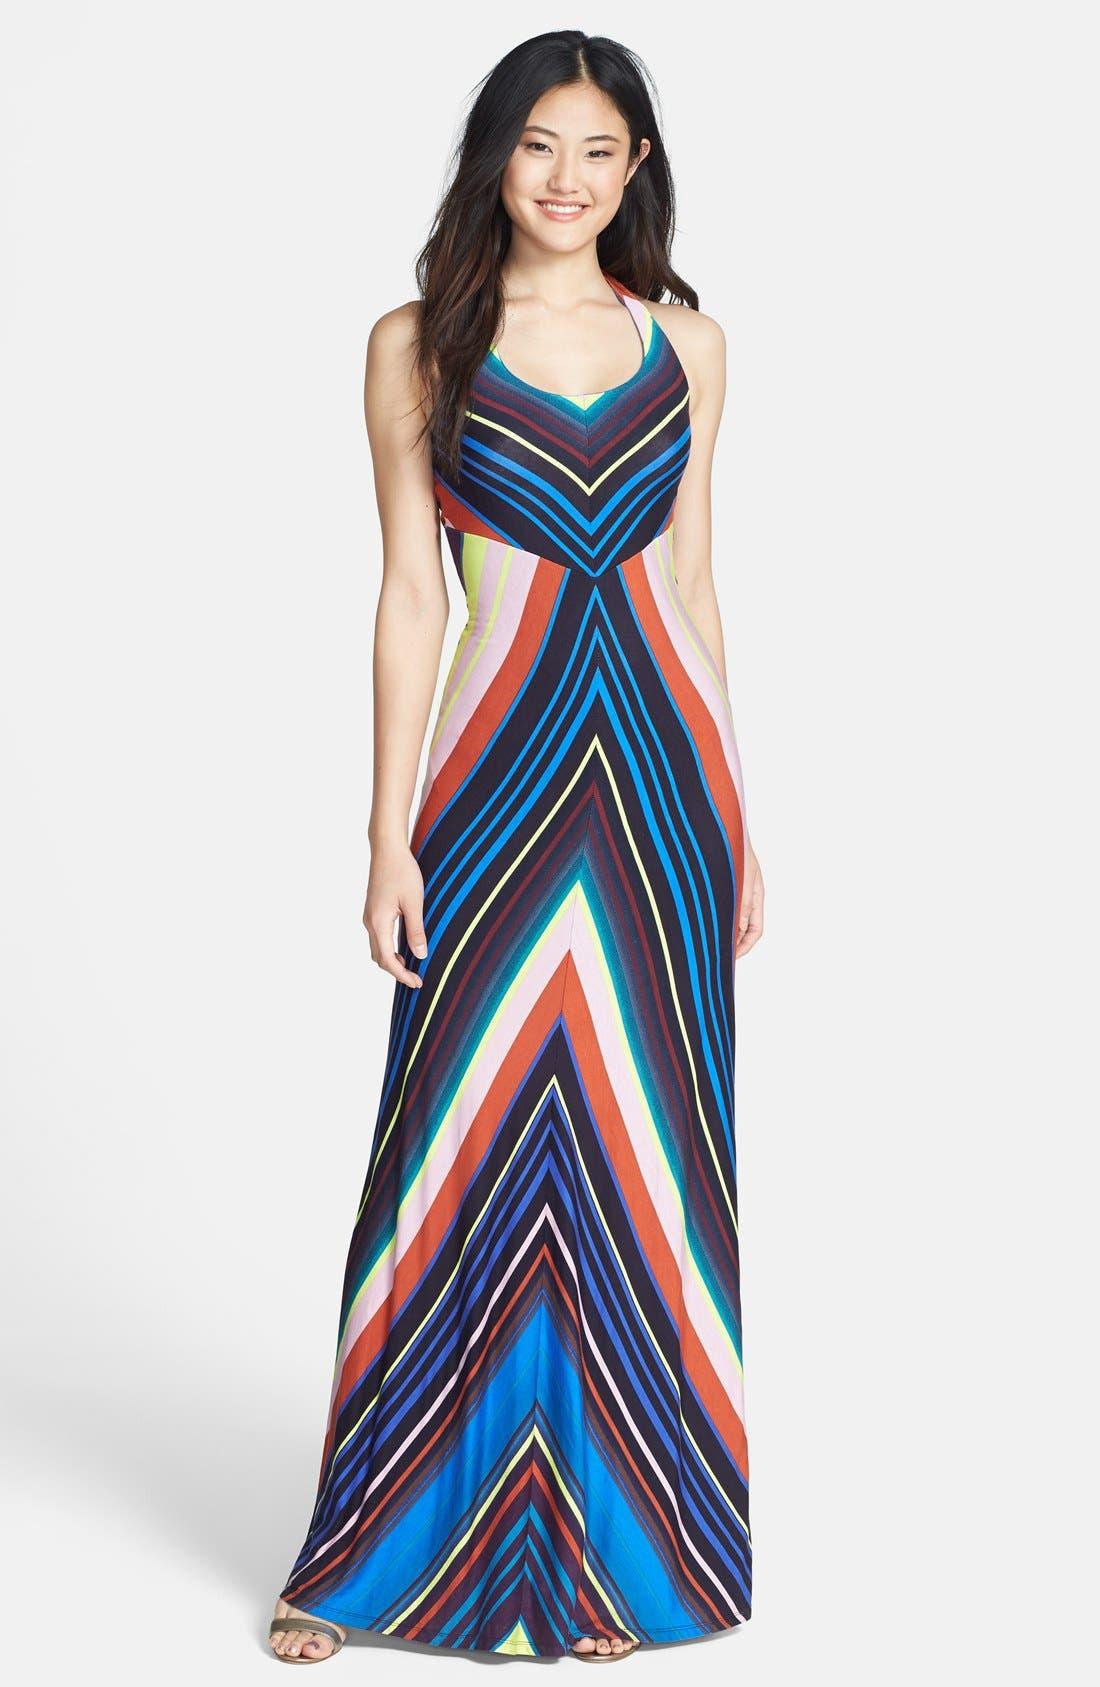 Main Image - Felicity & Coco Stripe Jersey Halter Dress (Regular & Petite) (Nordstrom Exclusive)